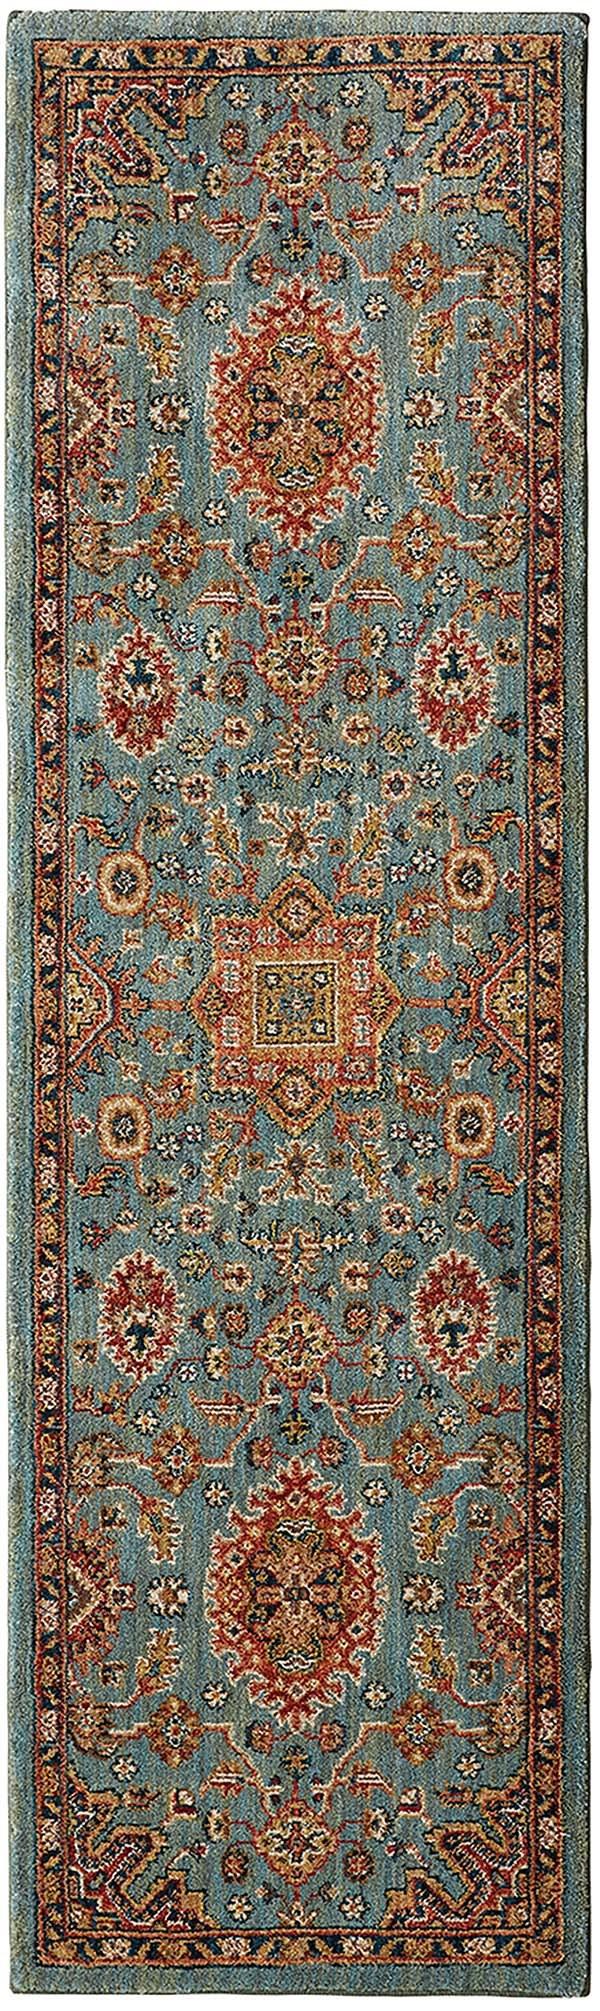 Aquamarine, Red (90665-50123) Traditional / Oriental Area Rug